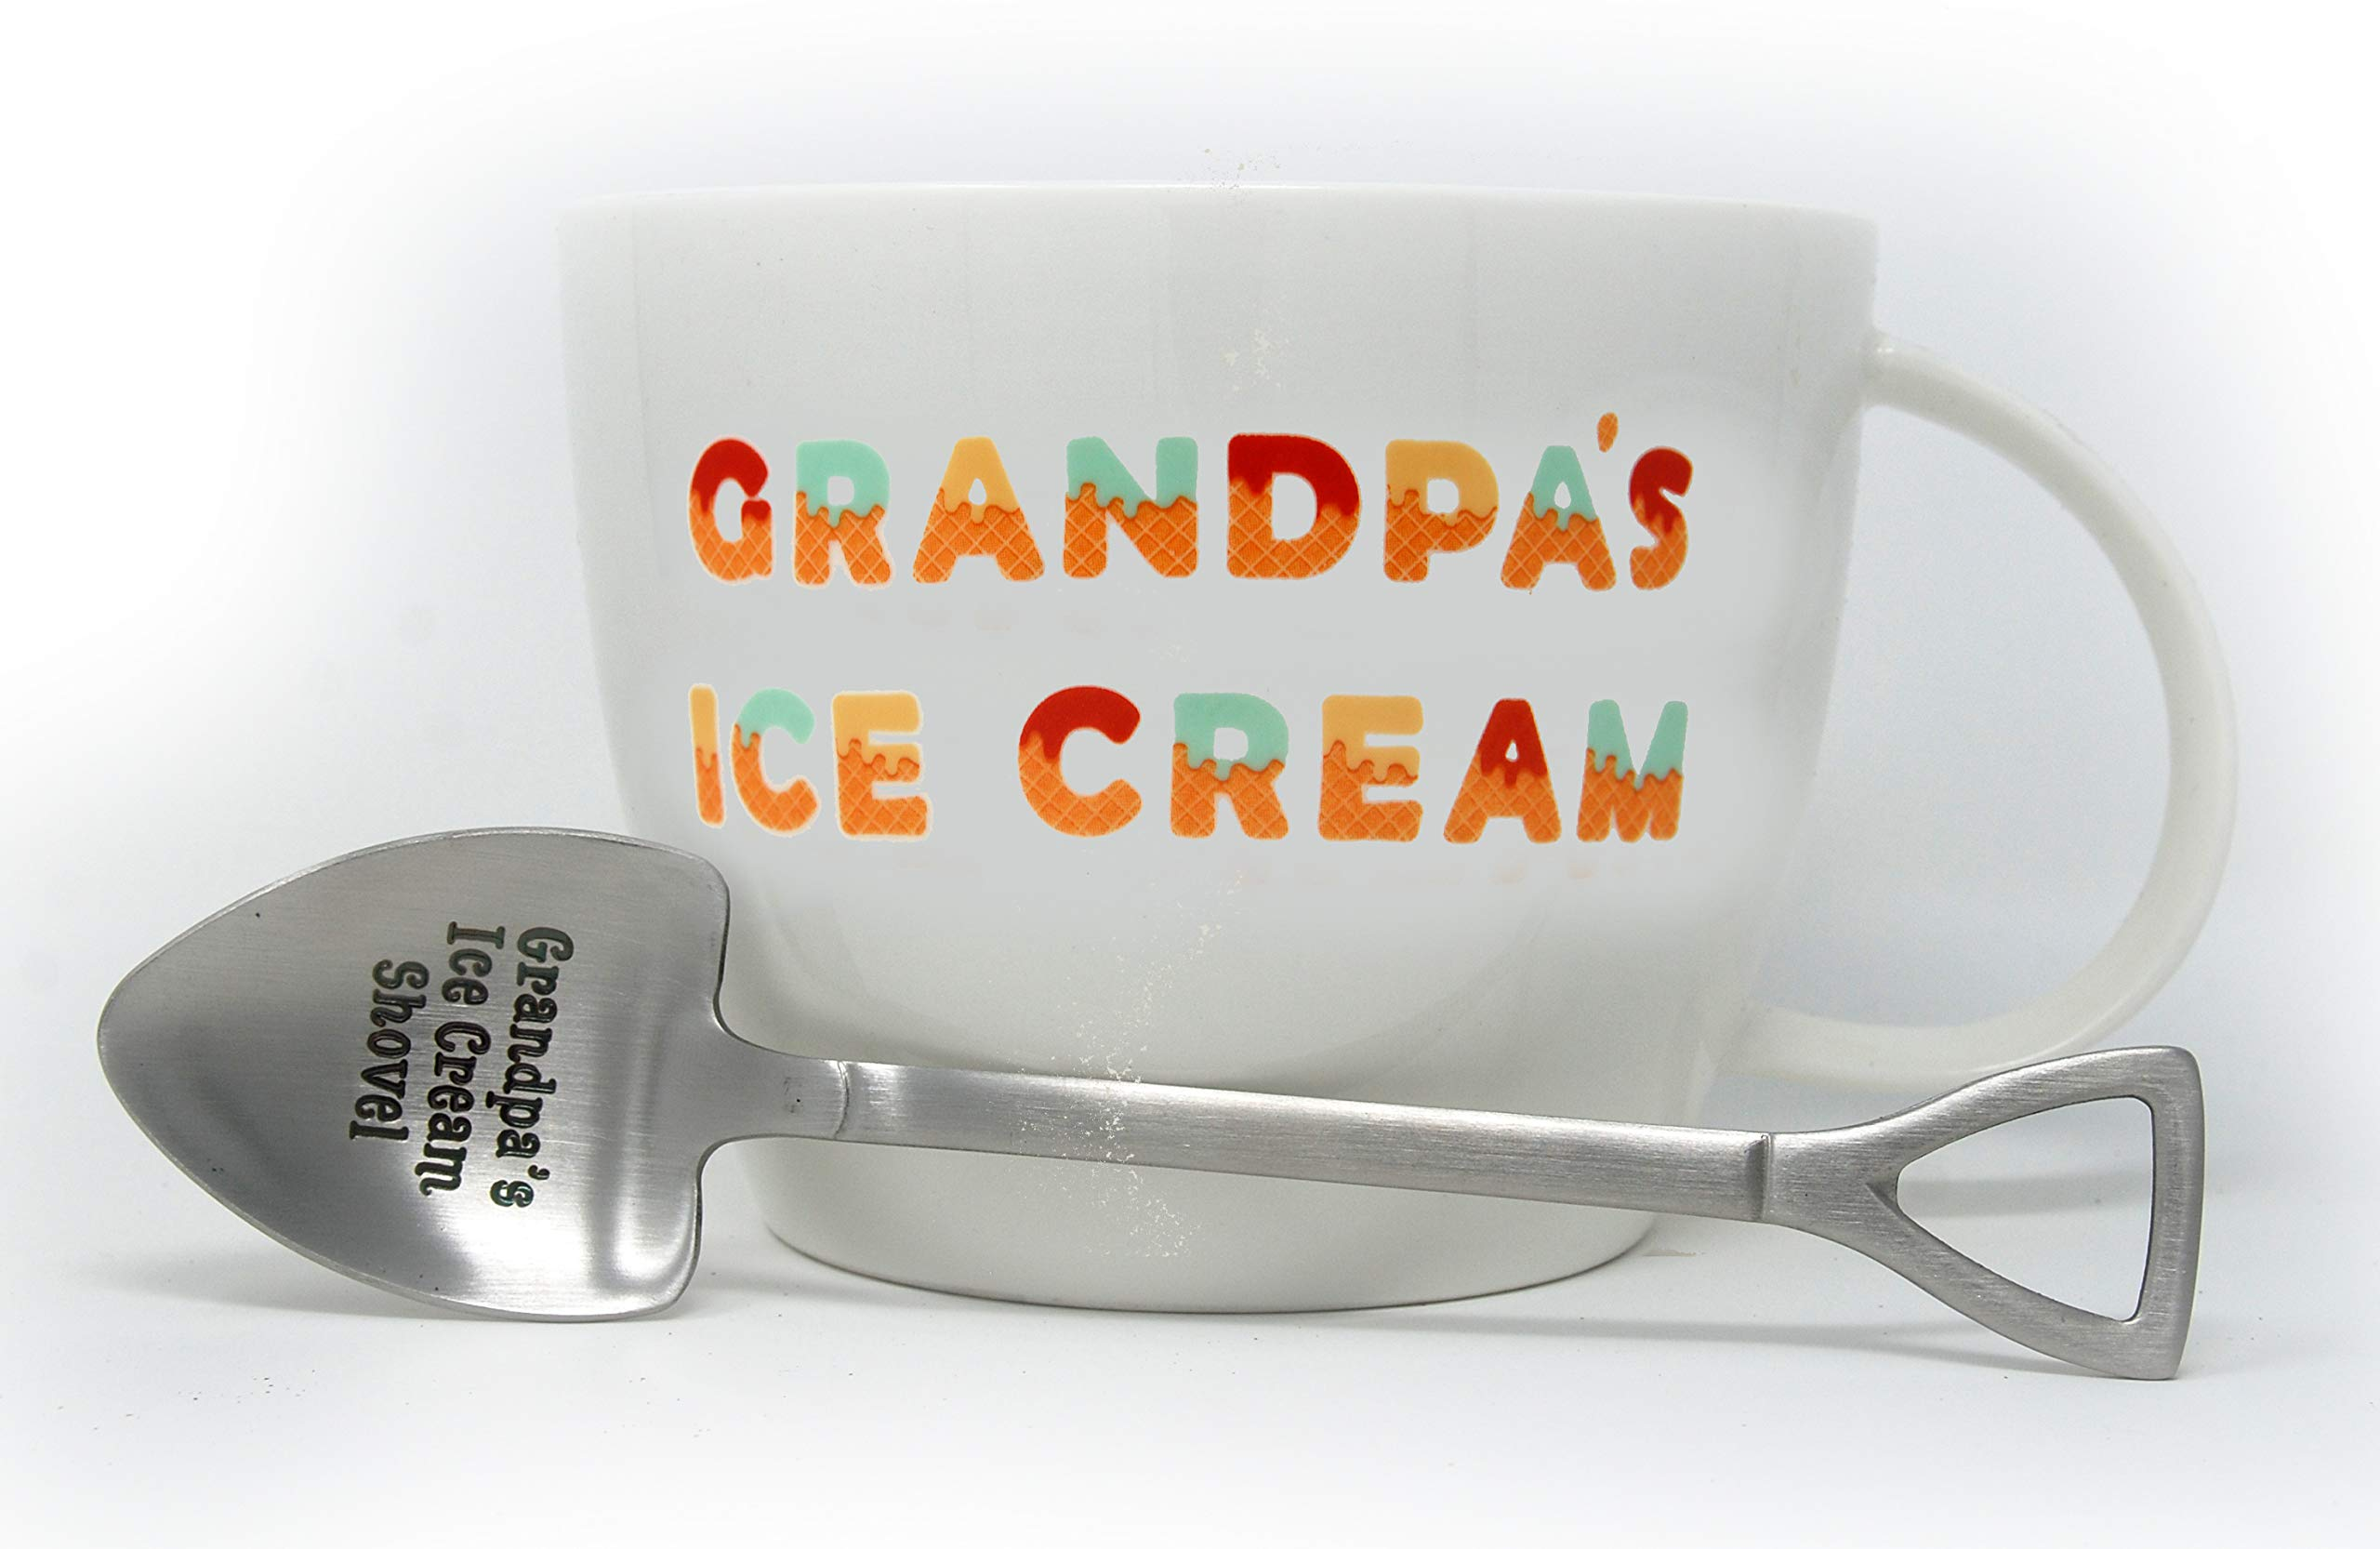 Josephine on Caffeine Gifts for Grandpa - Grandpa's Ice Cream Bowl and Engraved Spoon Grandpa's Ice Cream Shovel - Ideal or Birthday Gift by Josephine on Caffeine (Image #3)